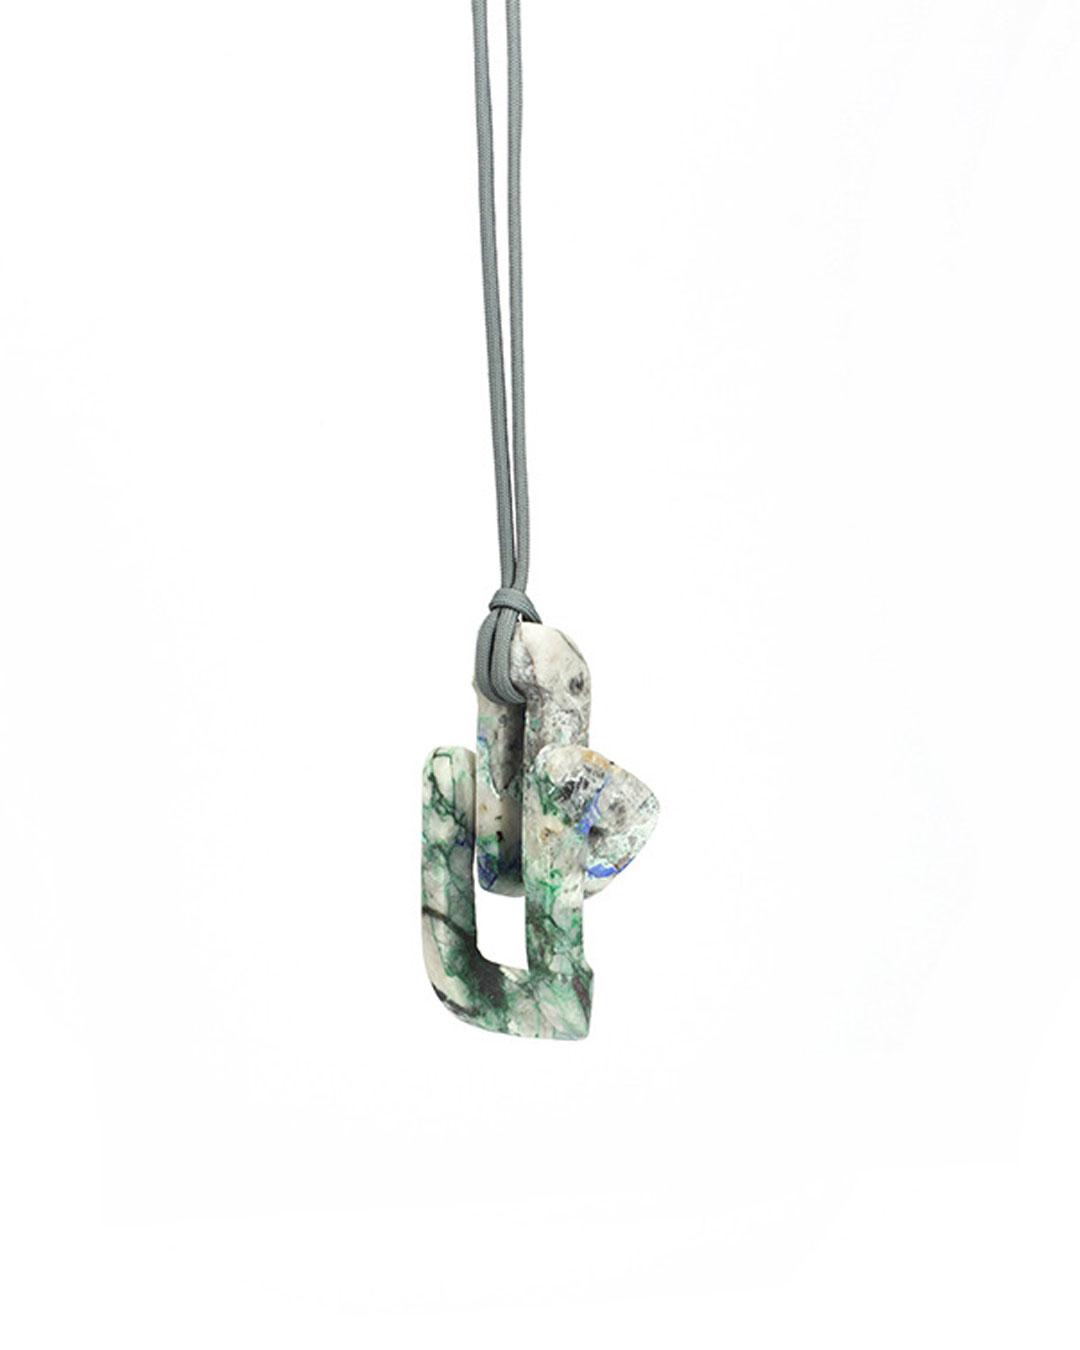 Edu Tarín, GOF3, 2019, pendant and object; azurite malachite , 110 x 65 x 50 mm, €4500 (image 1/2)